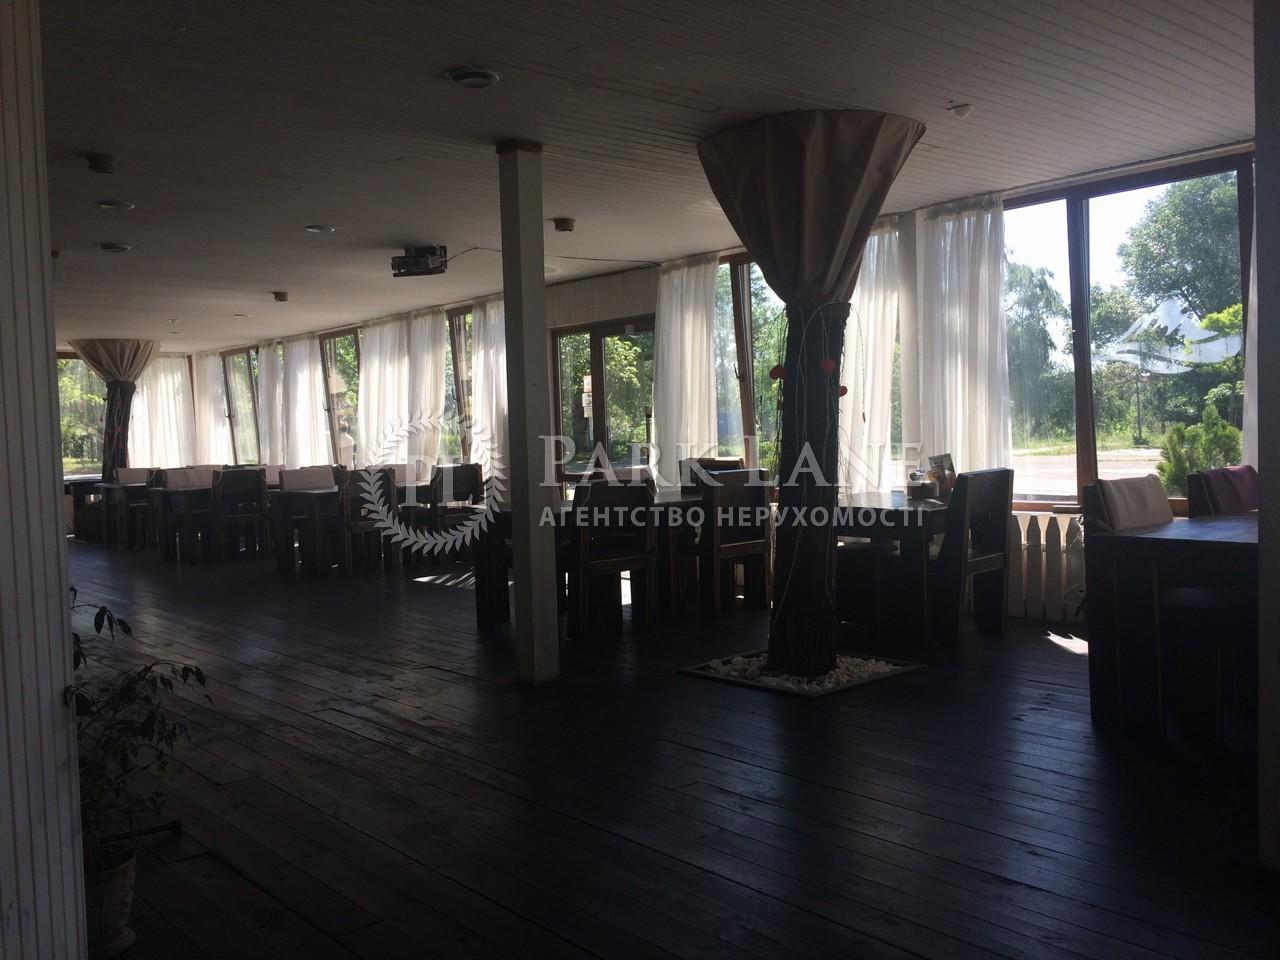 Ресторан, J-25790, Приозерная, Киев - Фото 5